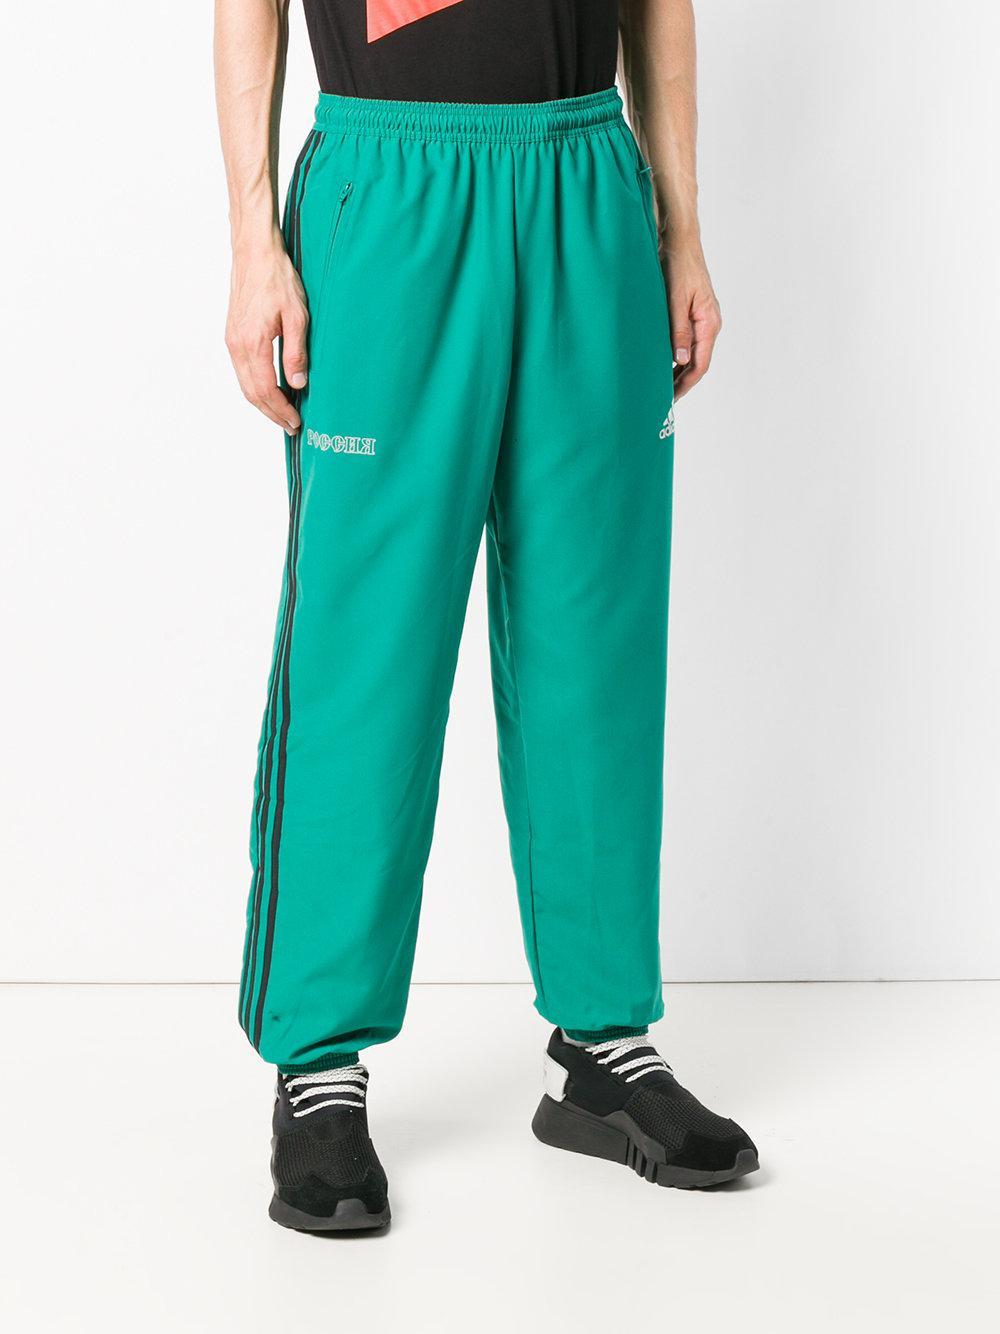 Gosha Pour Jogging Pantalon Rubchinskiy De Adidas X Homme En Coloris Green rCdxBoe